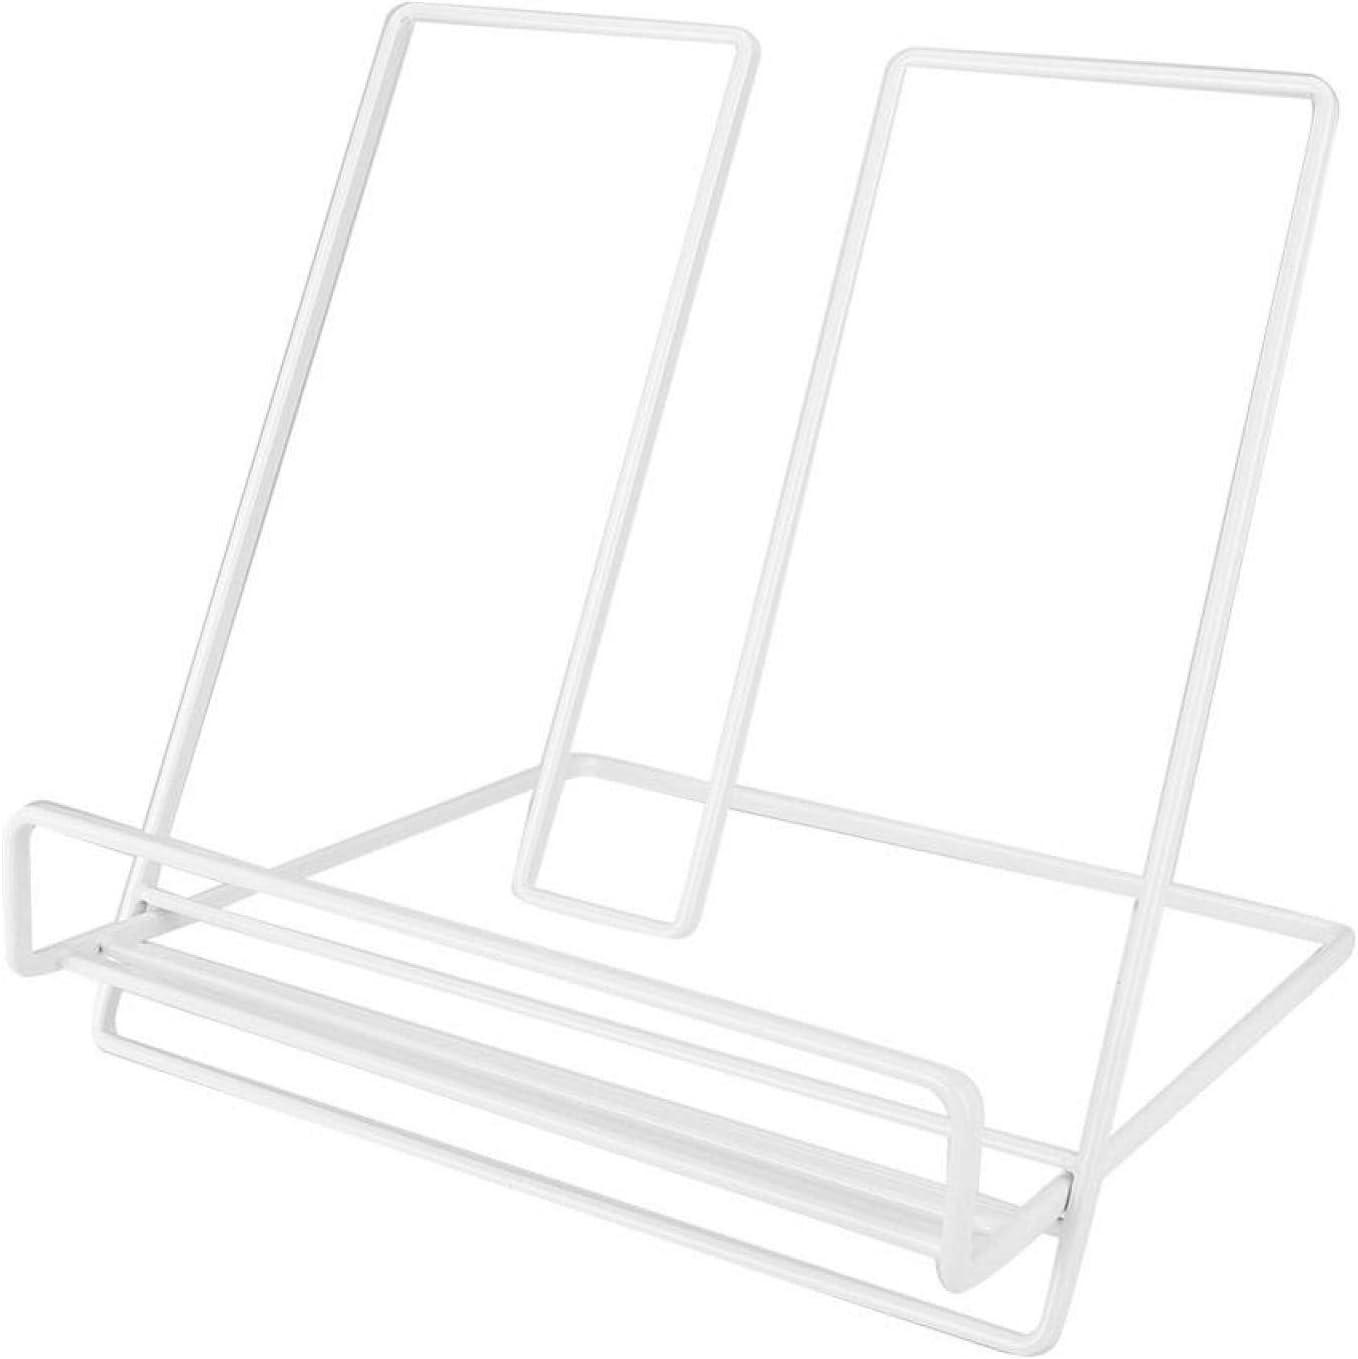 Smooth Edge Book Stand Durable 19 x 19 x 18.5 cm / 7.5 x 7.5 x 7